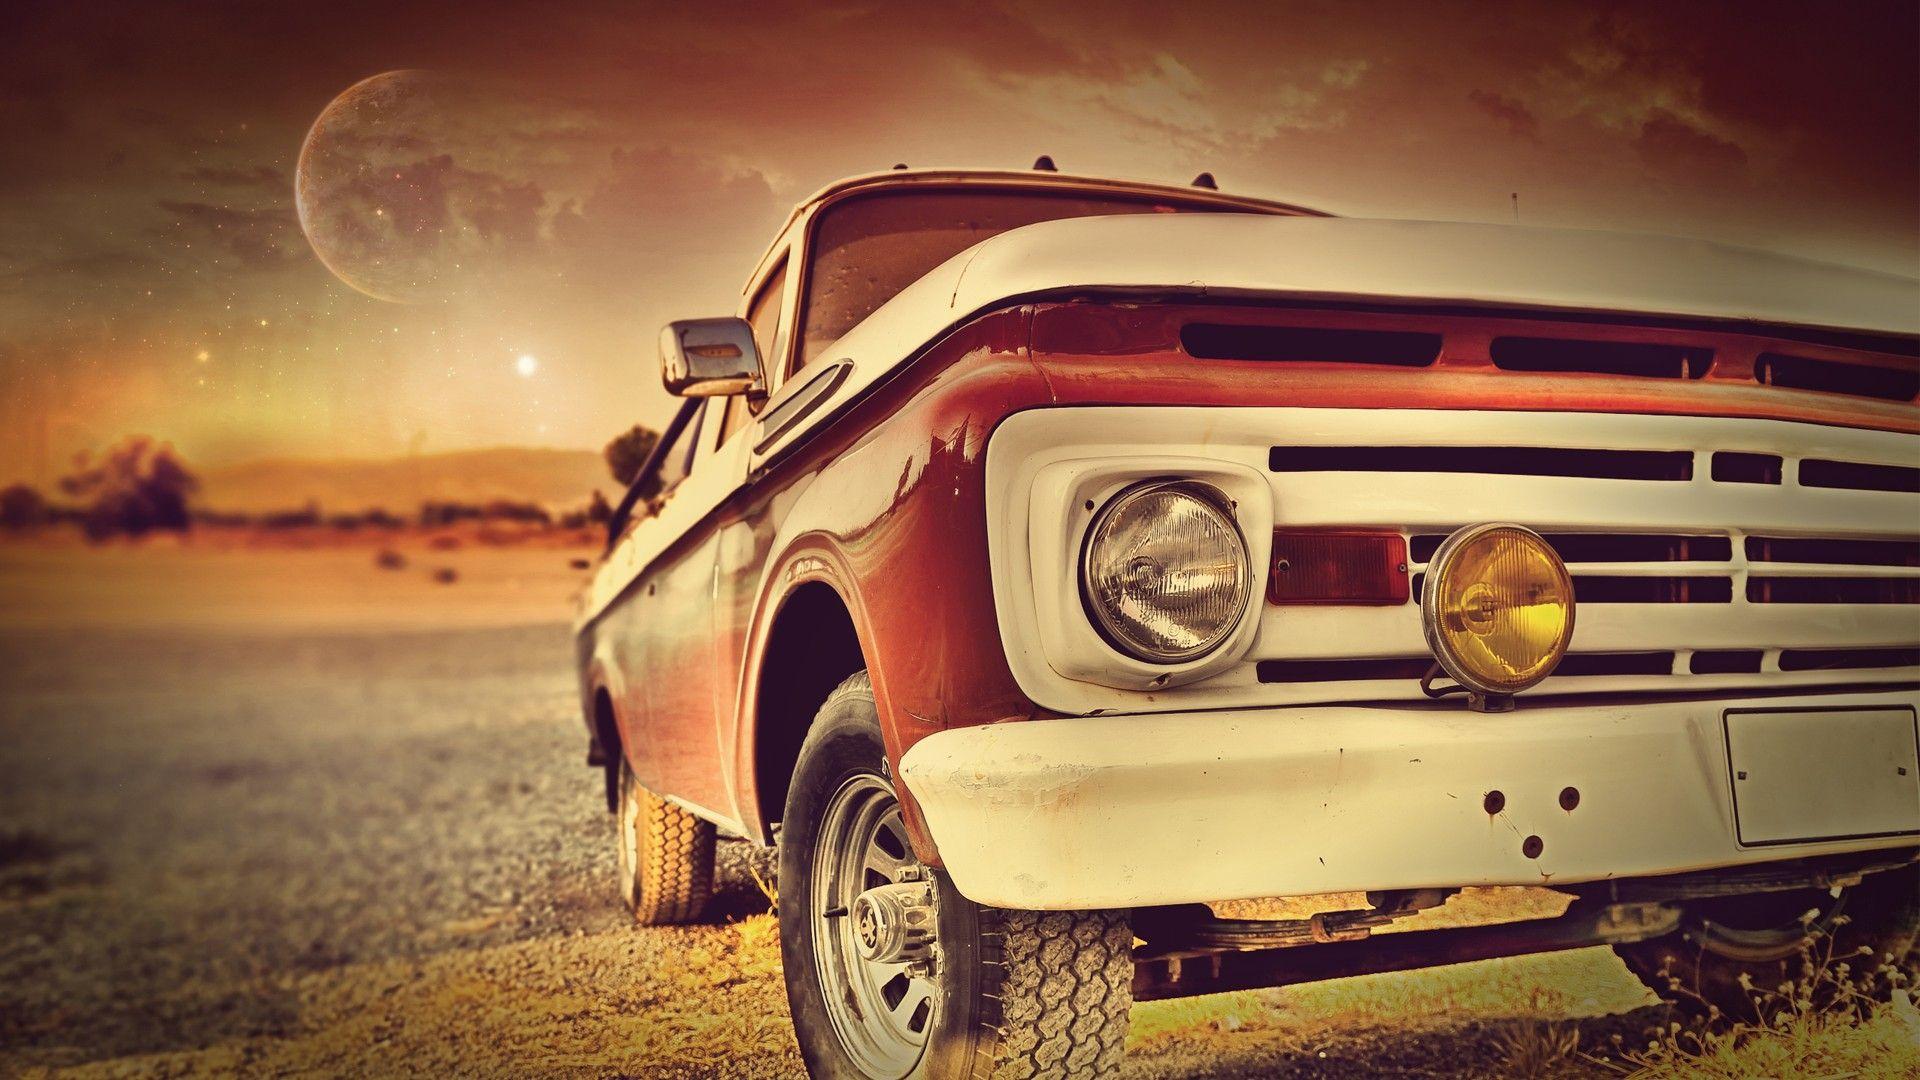 Vintage Cars Wallpapers Best Wallpapers Vintage Car Wallpaper Car Wallpapers Retro Cars